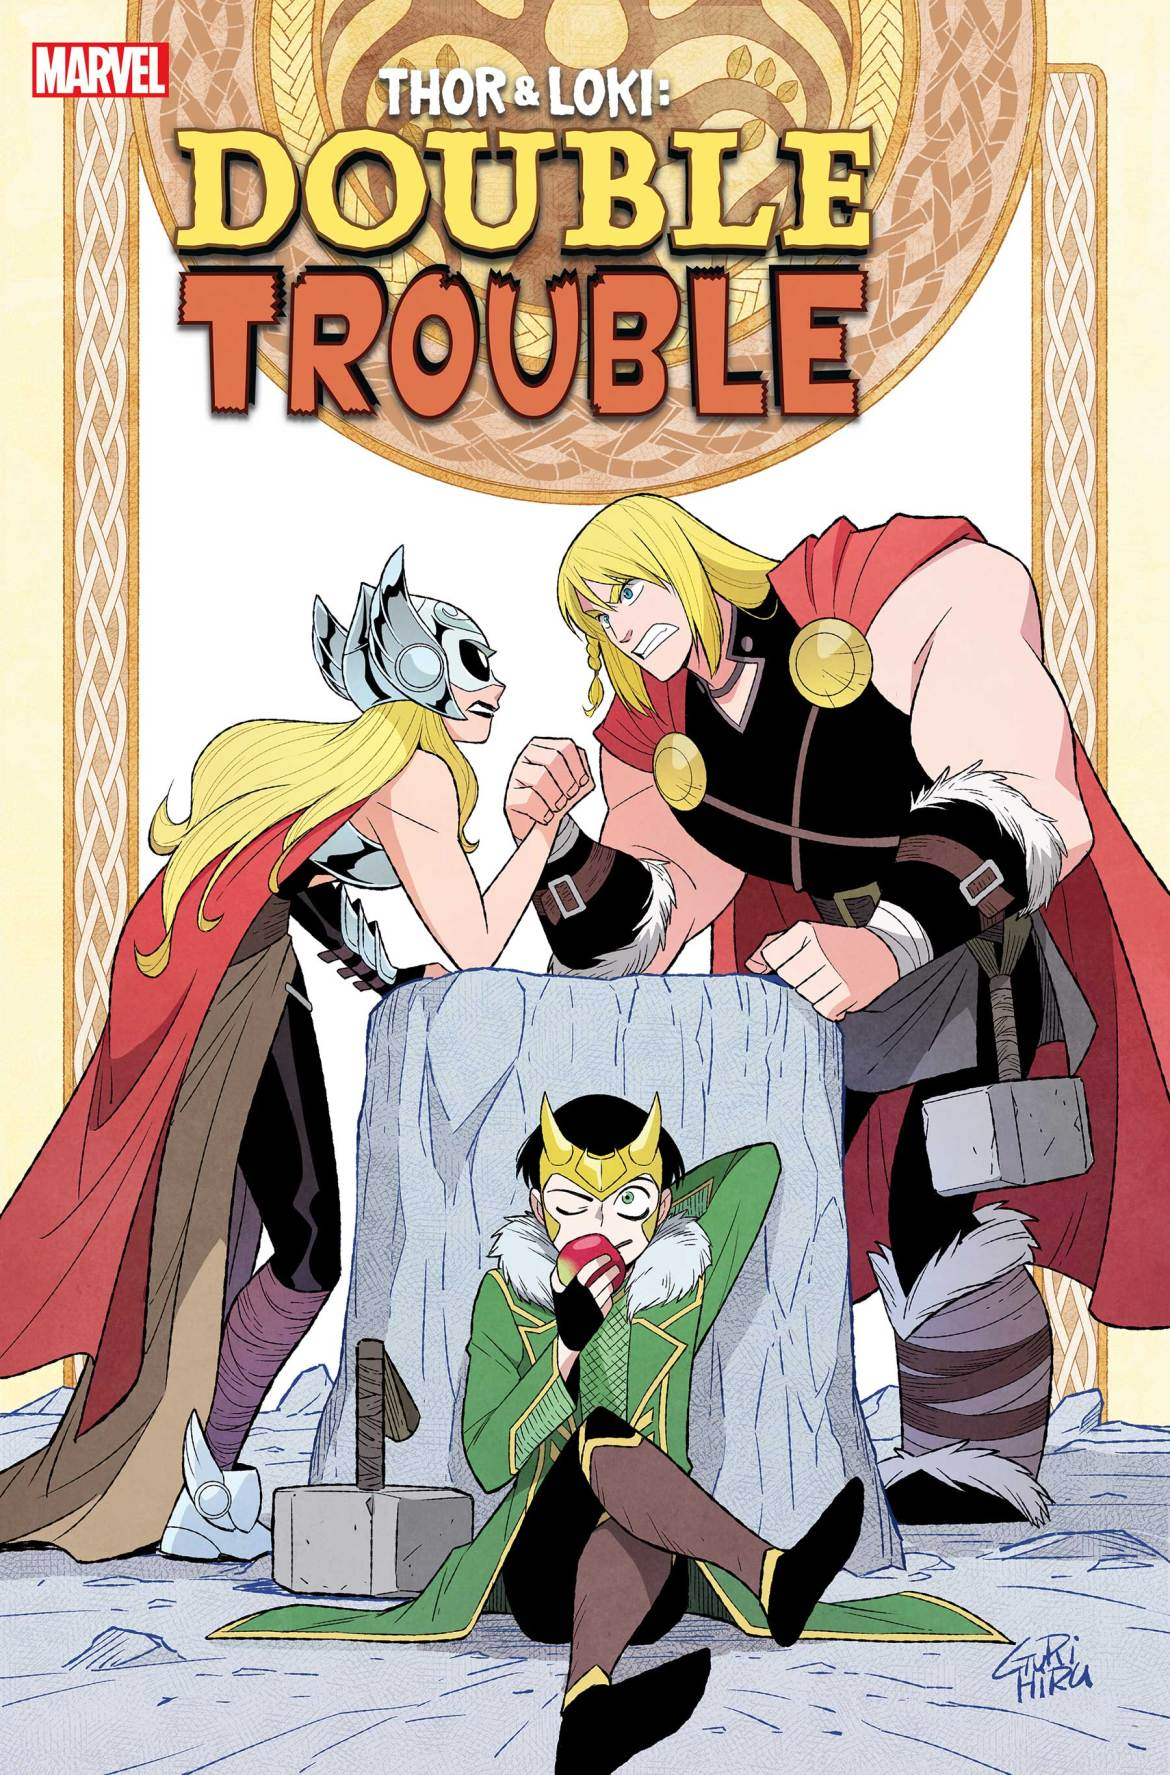 THORLOKIDT2021003_Cov Marvel Comics May 2021 Solicitations